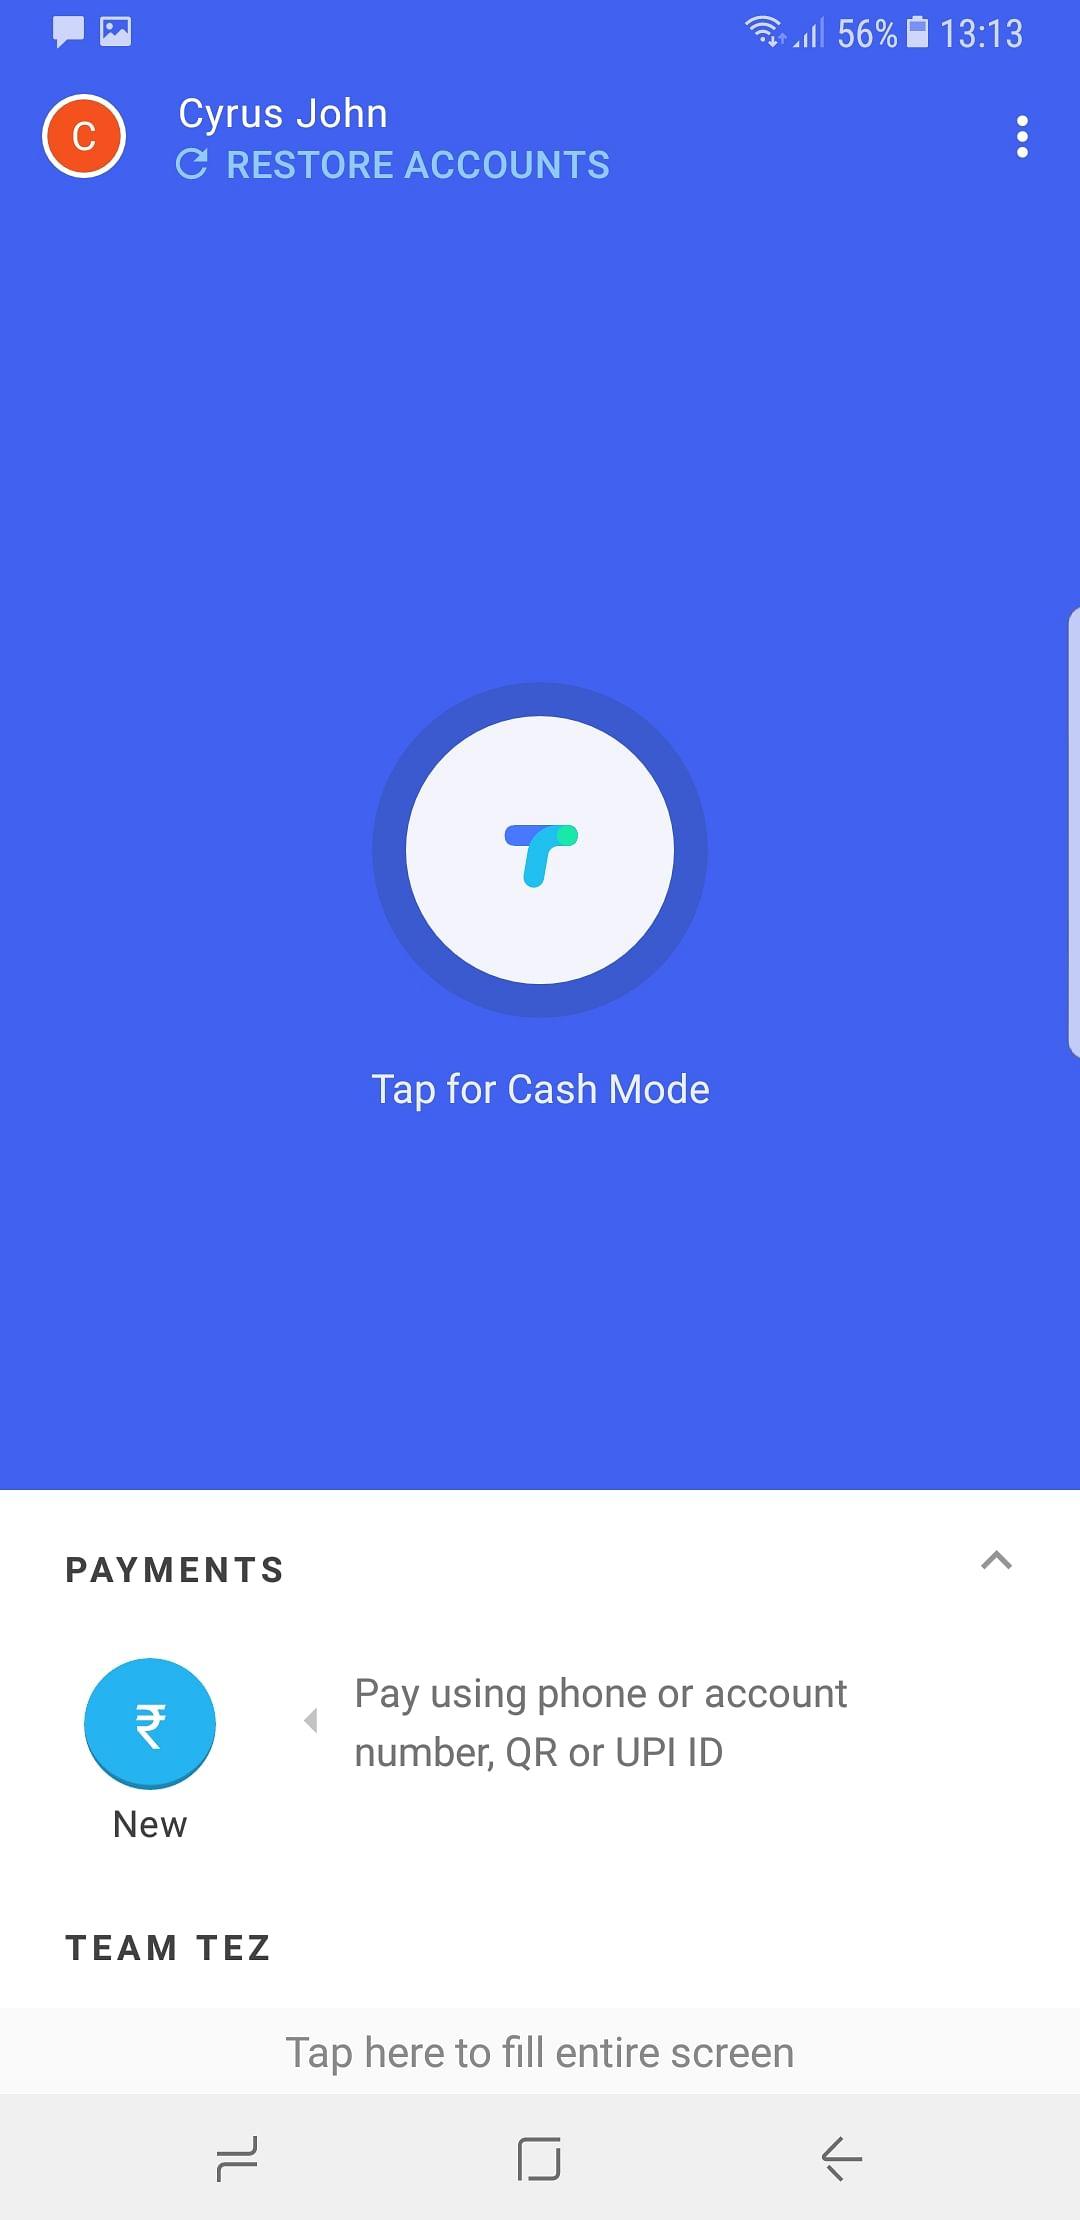 Google's Tez offers